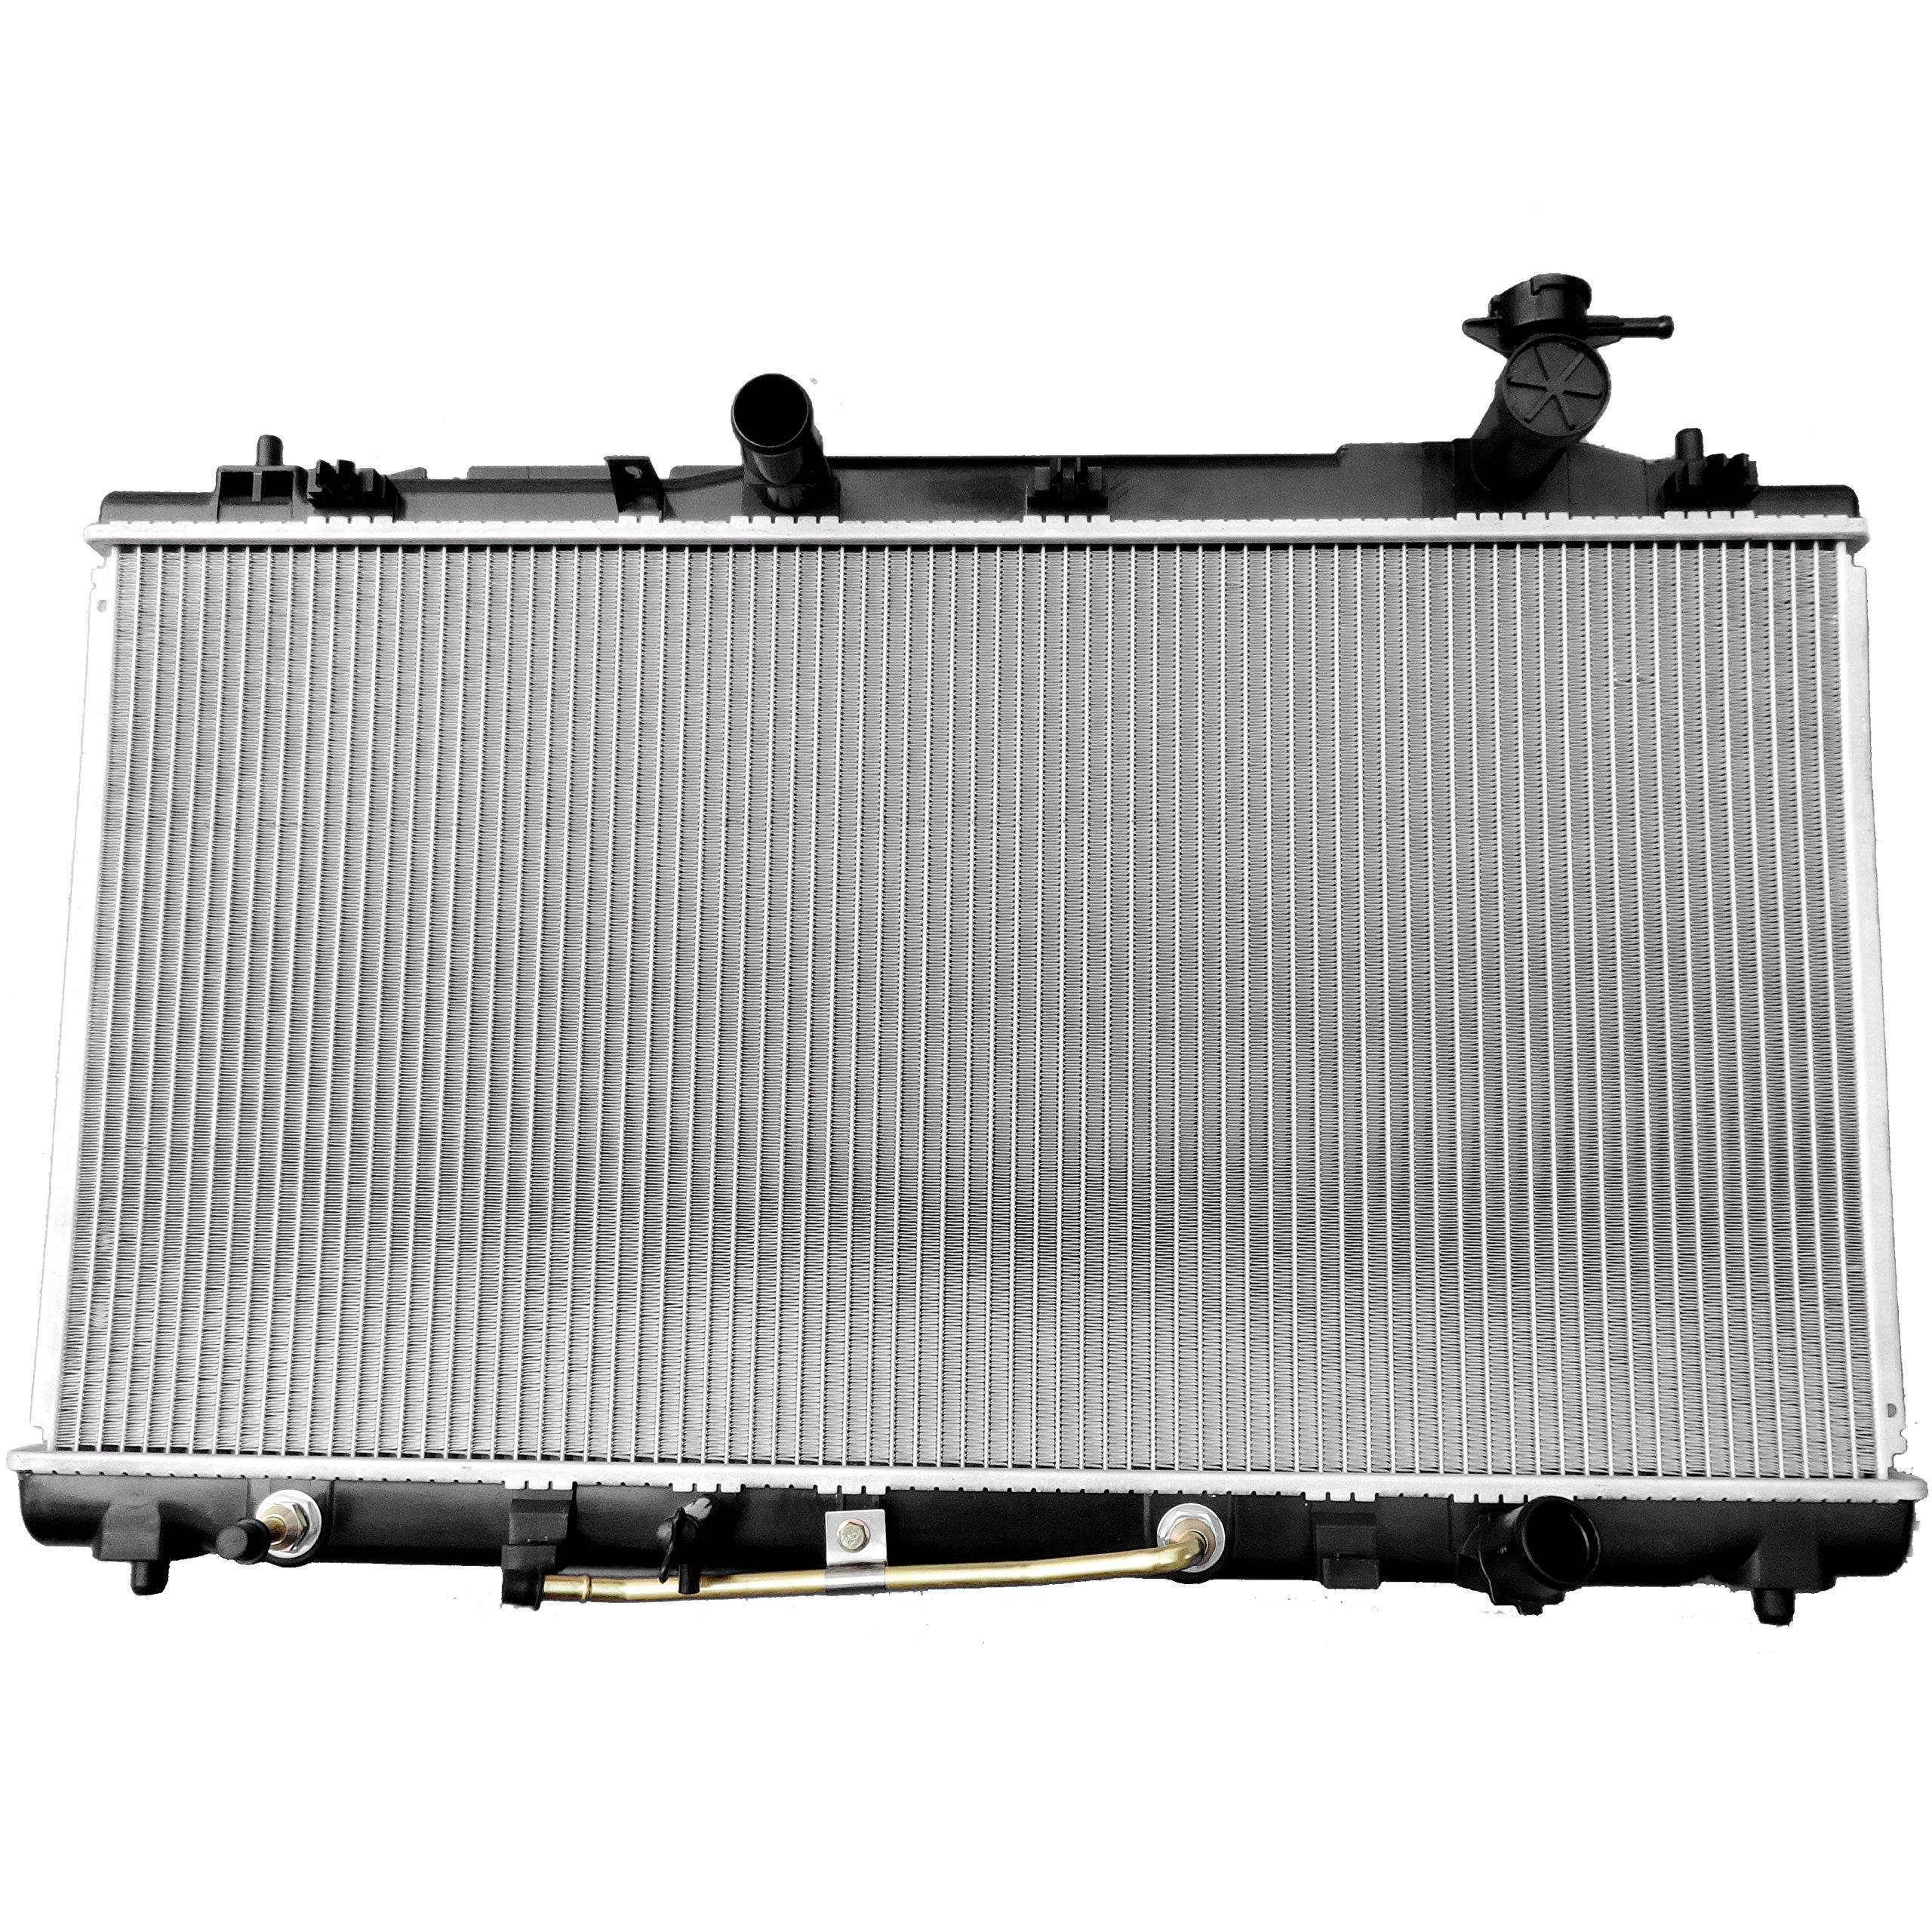 ECCPP 2817 Radiator fits for 2007-2009 Lexus ES350 Base Sedan 4-Door 3.5L 2009 Toyota Venza Base Sport Utility 4-Door 3.5L